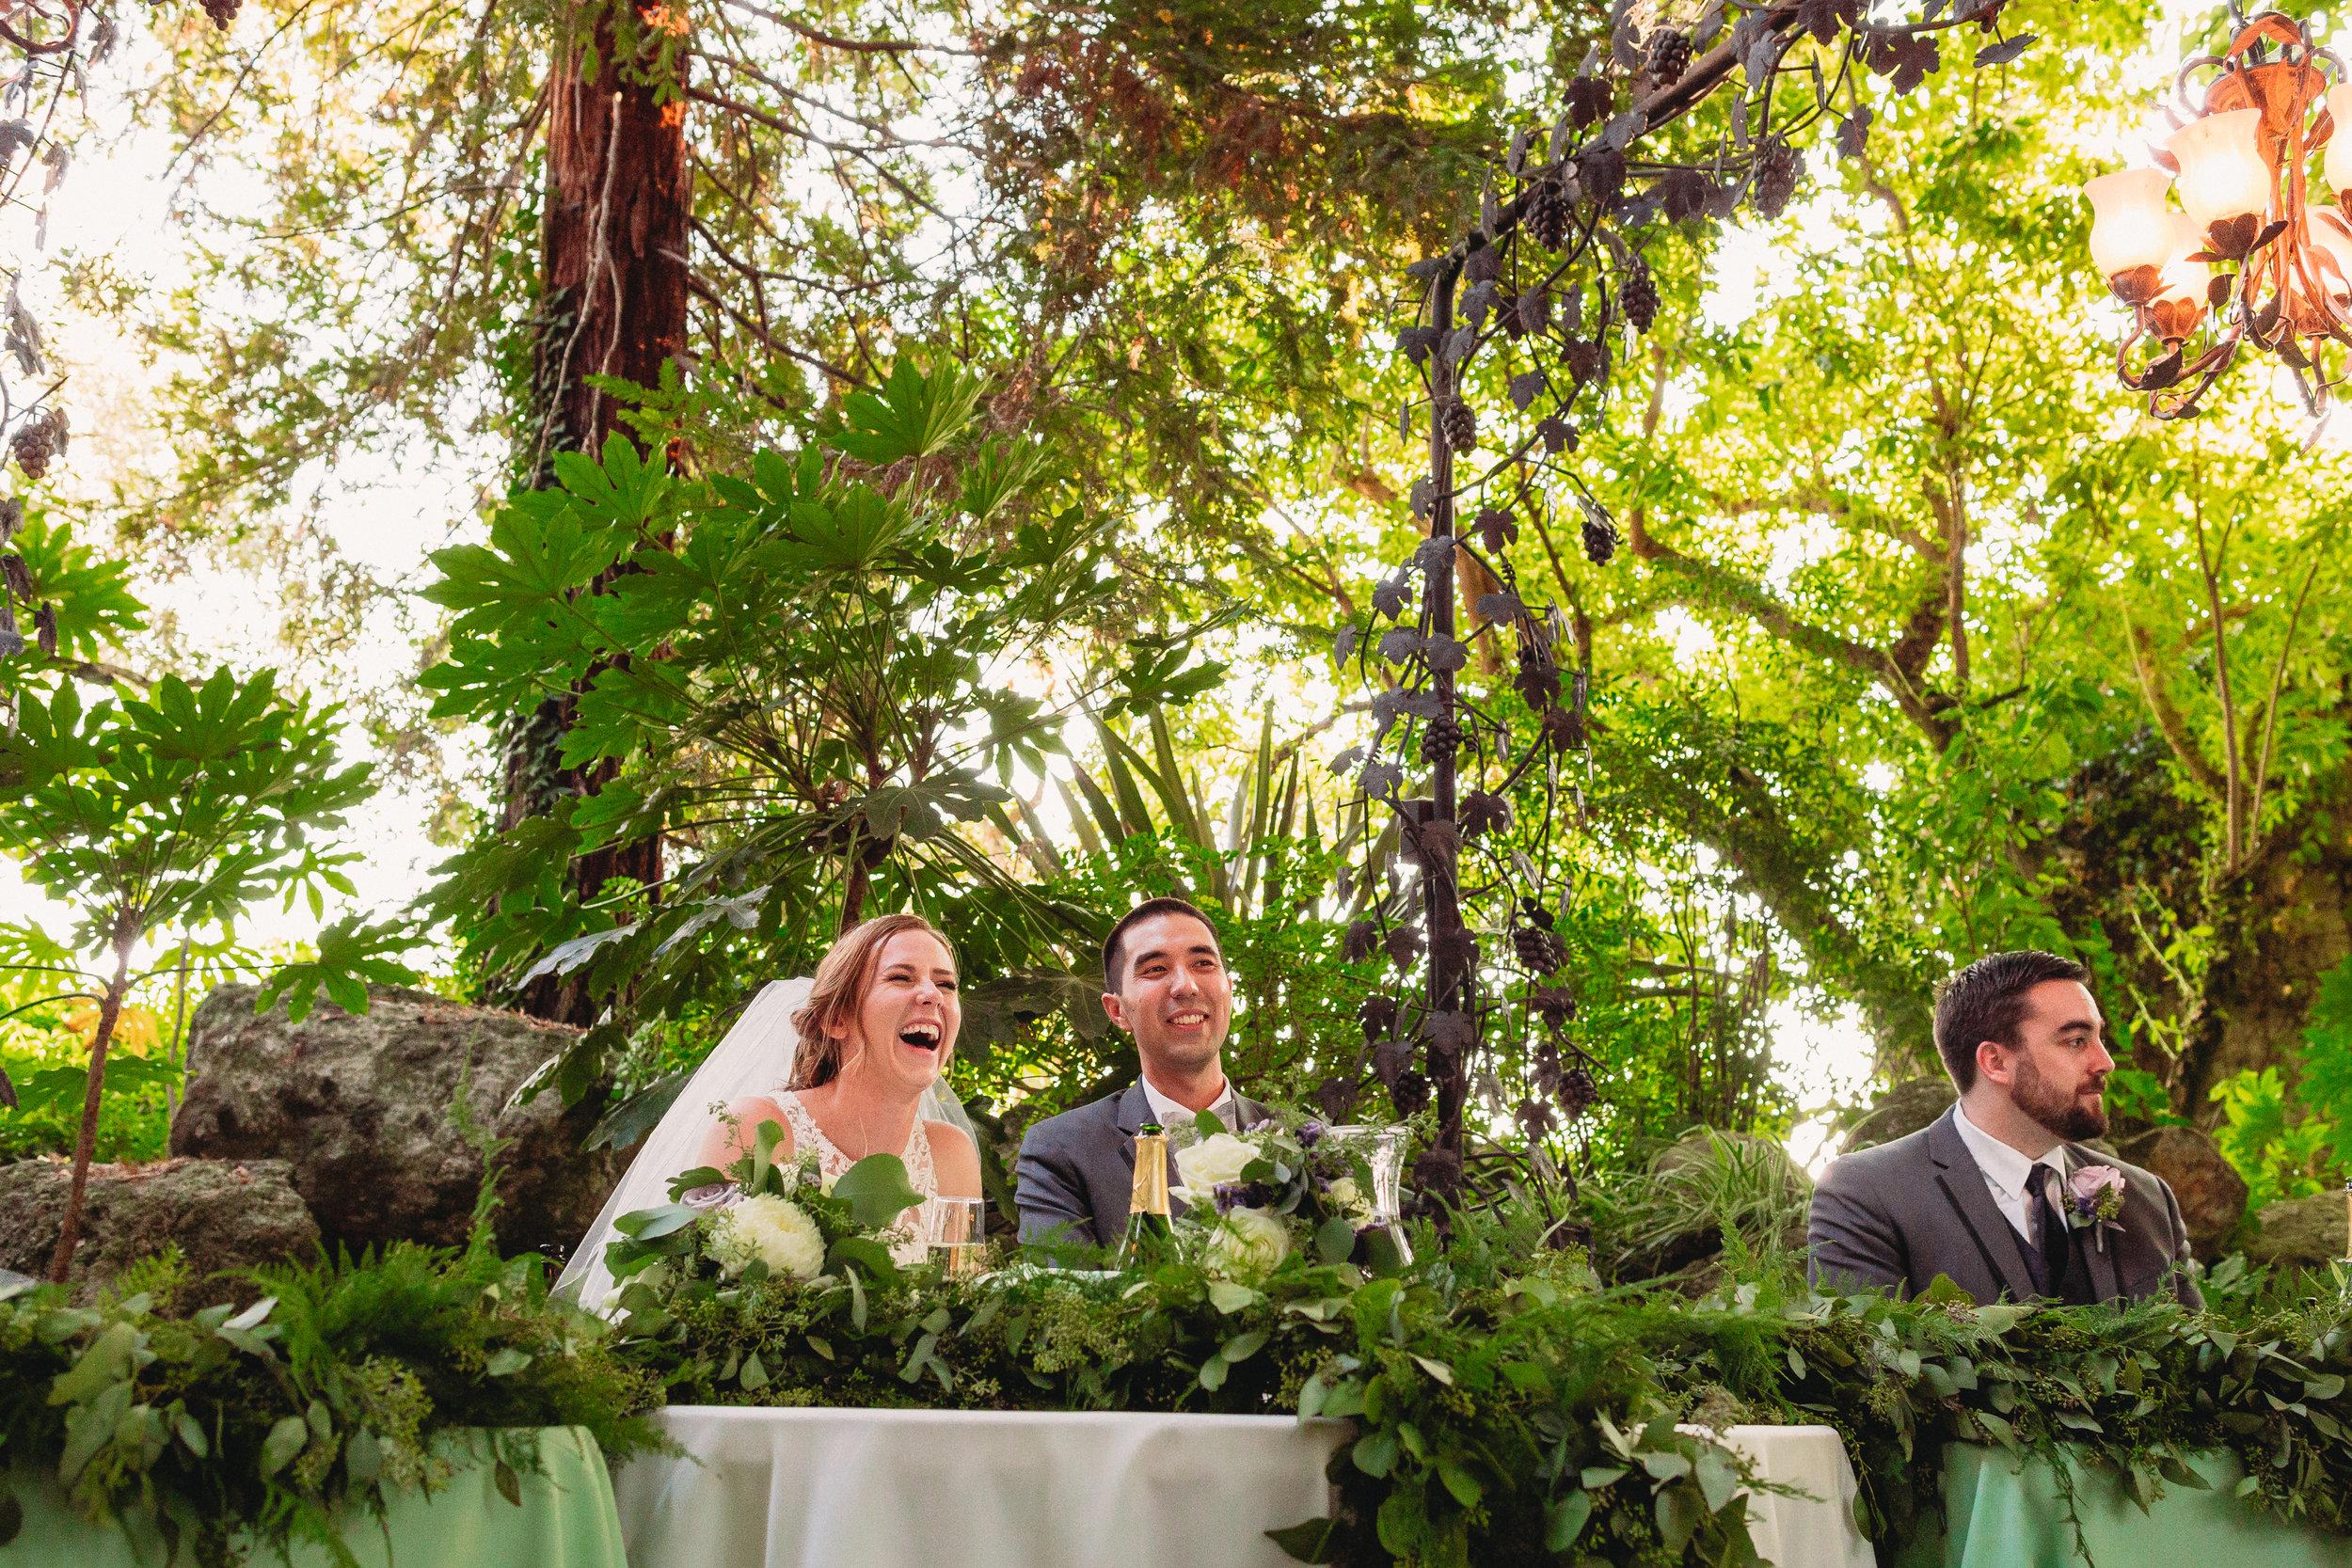 rebeccaylasotras-bay-area-garden-wedding-78.jpg